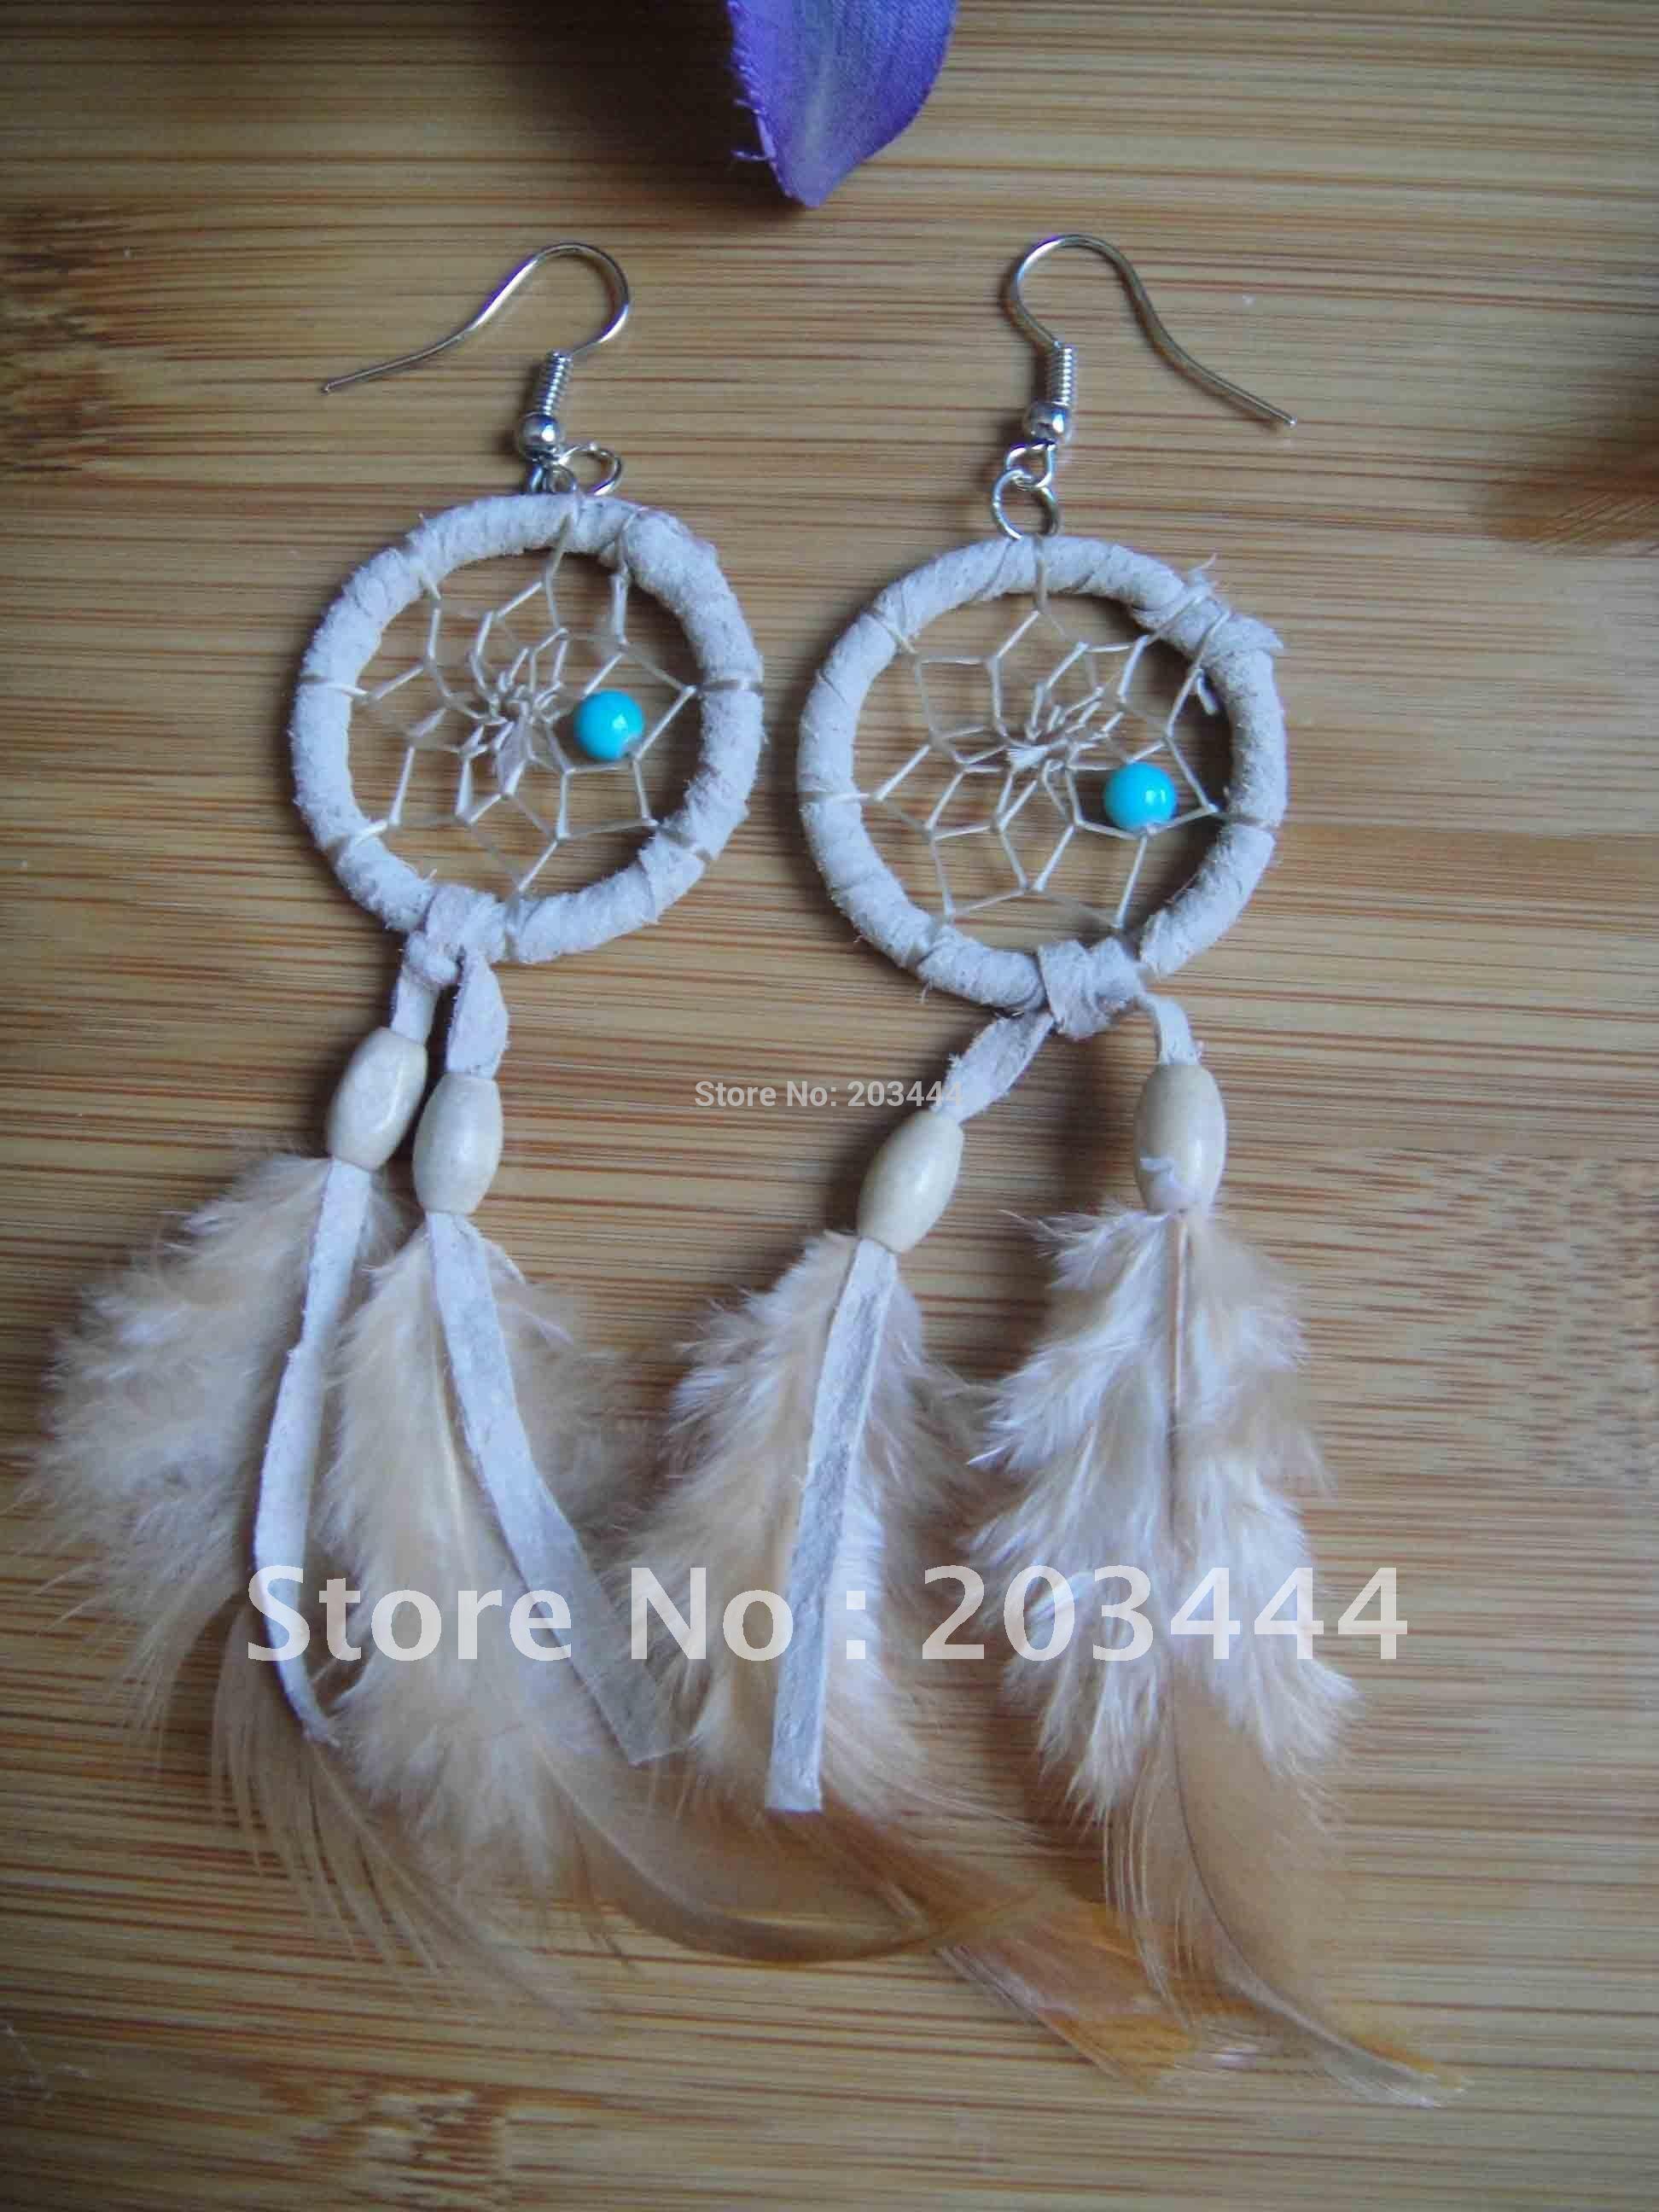 shipping free native american dream catcher earring!!(China (Mainland))